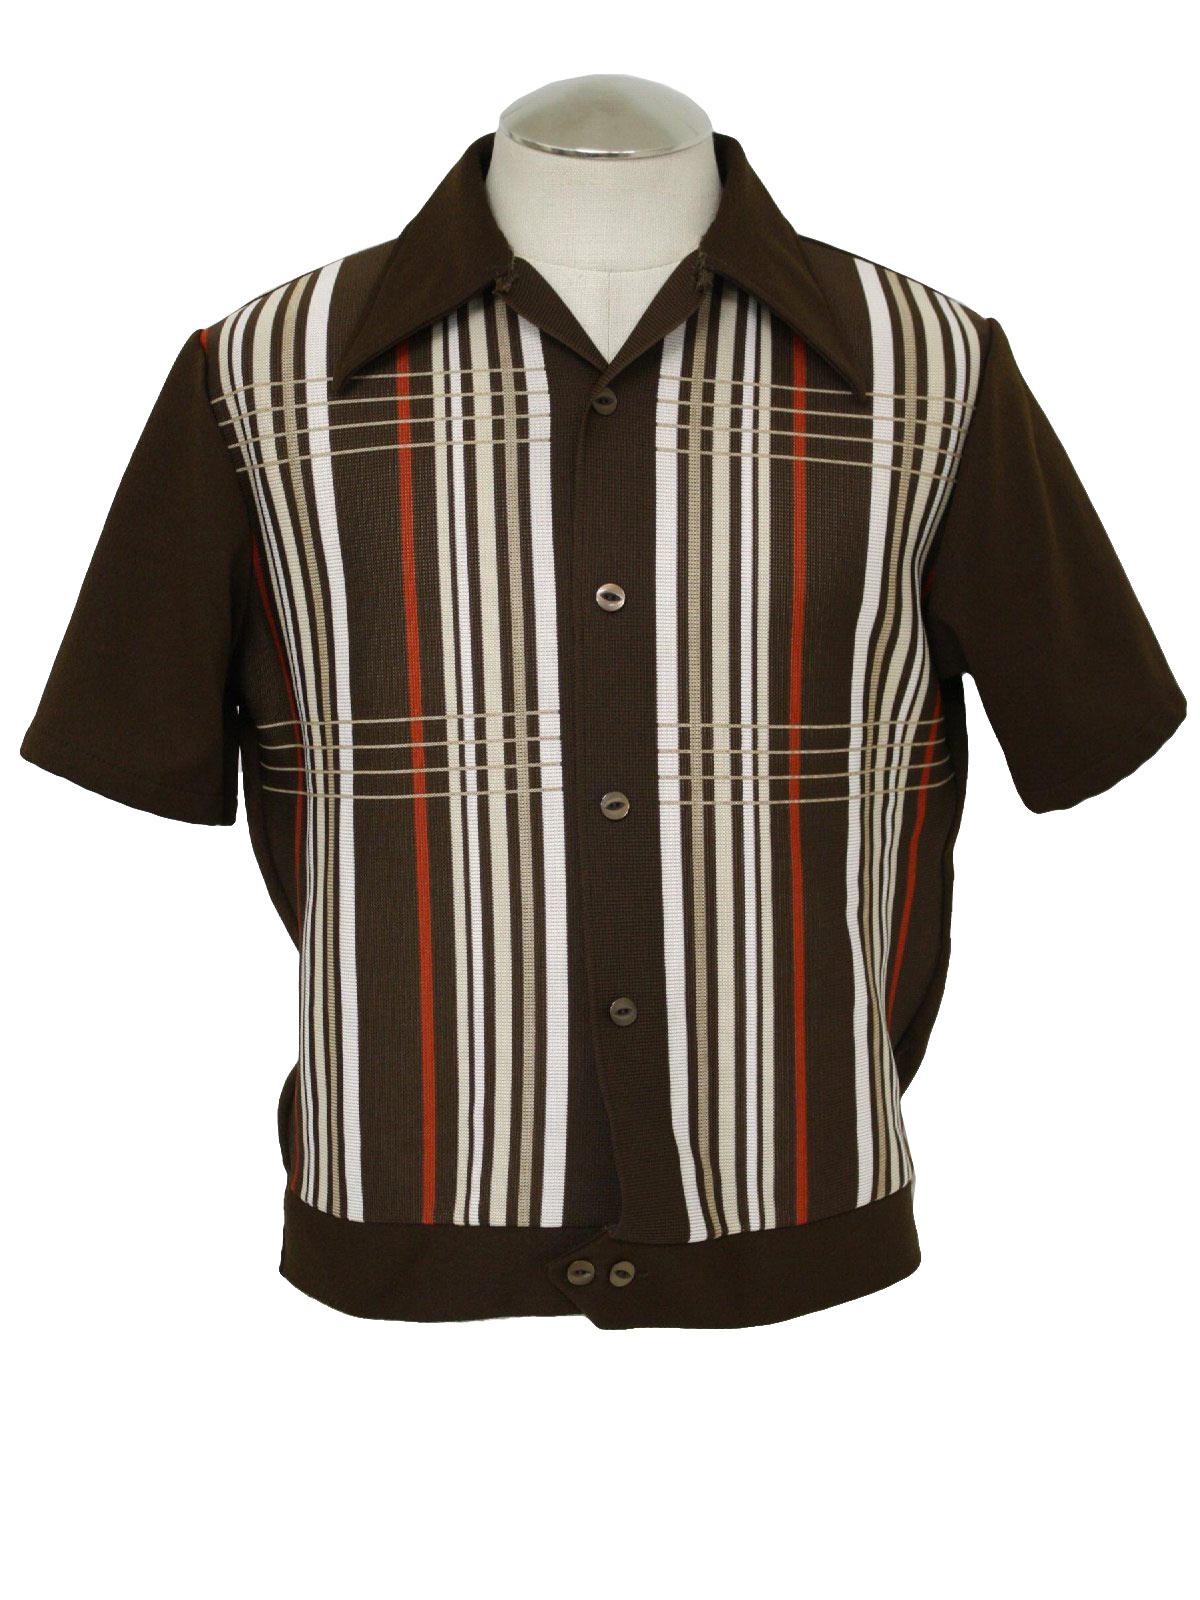 Gaucho Seventies Vintage Jacket 70s Gaucho Mens deep